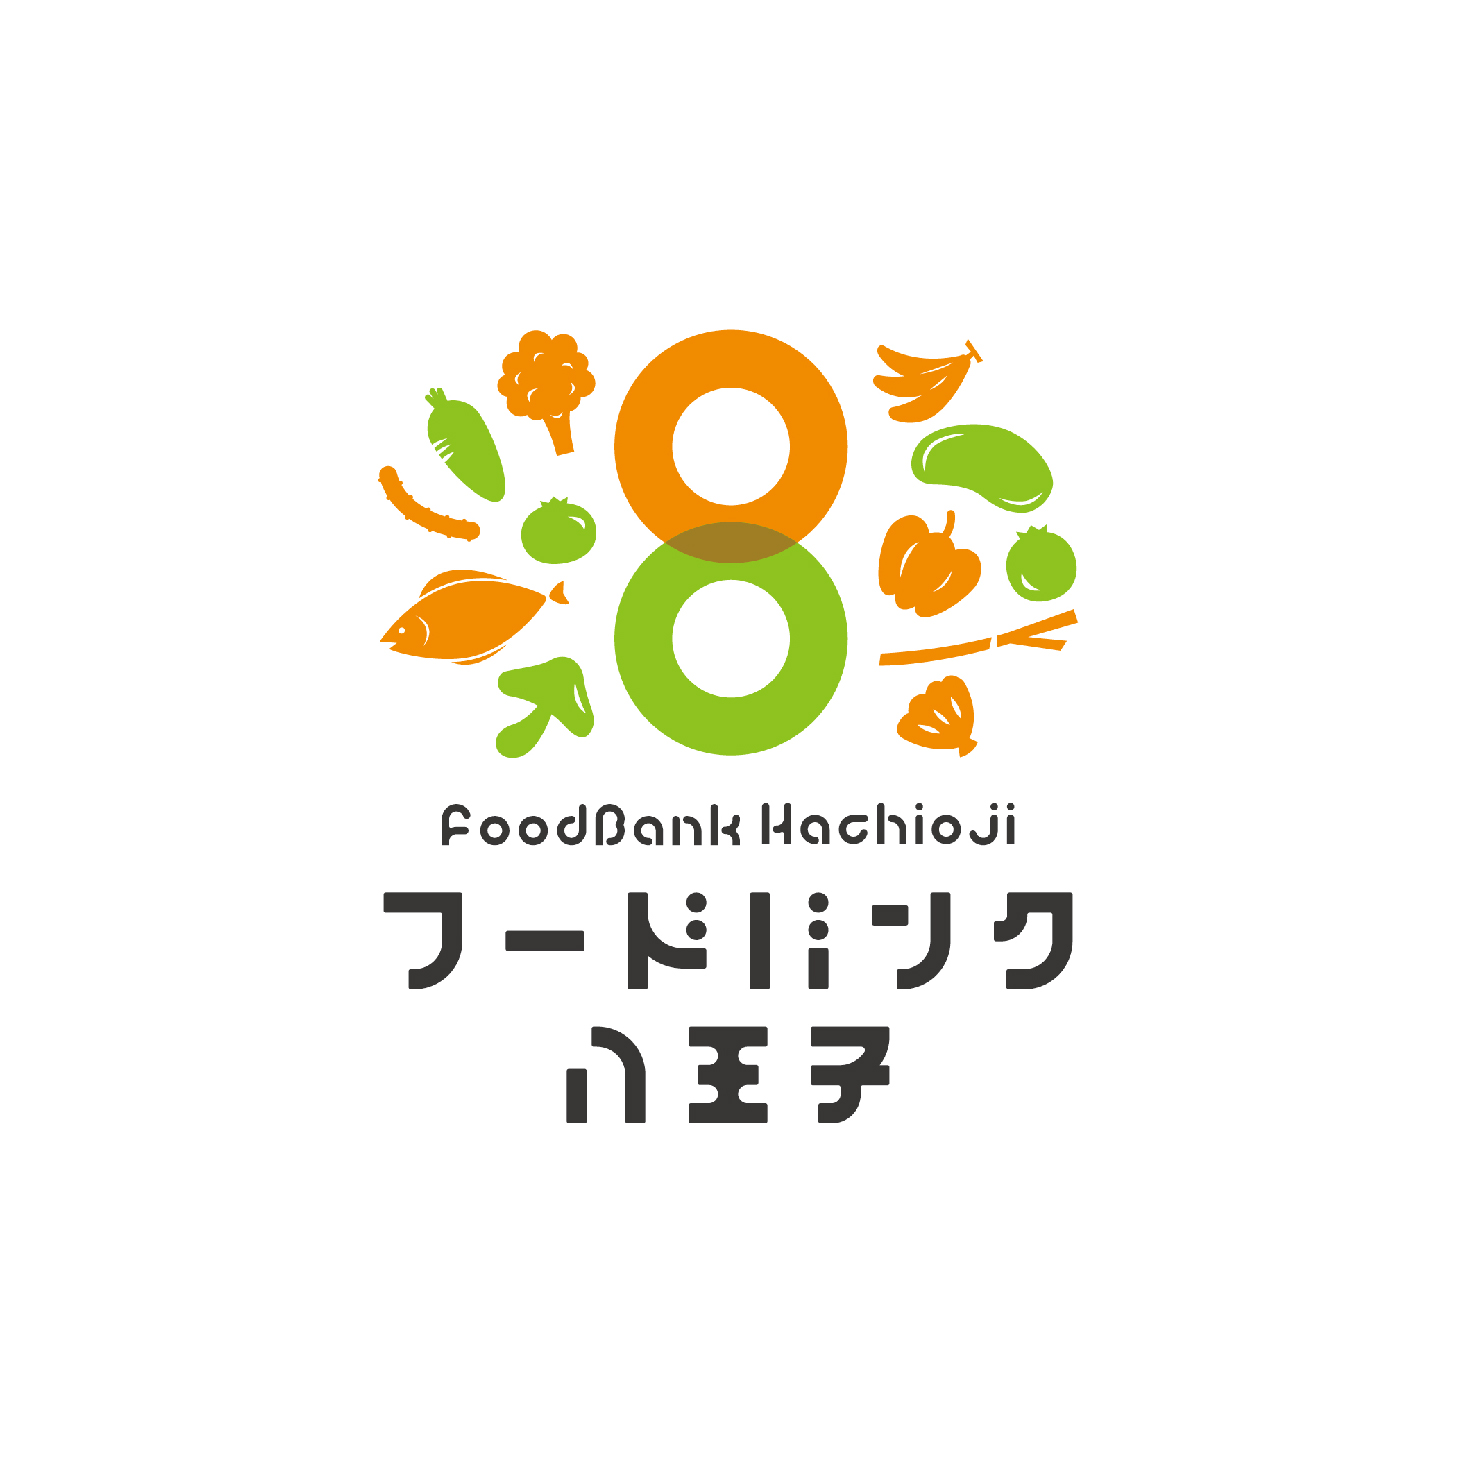 foodbank hachioji / logo